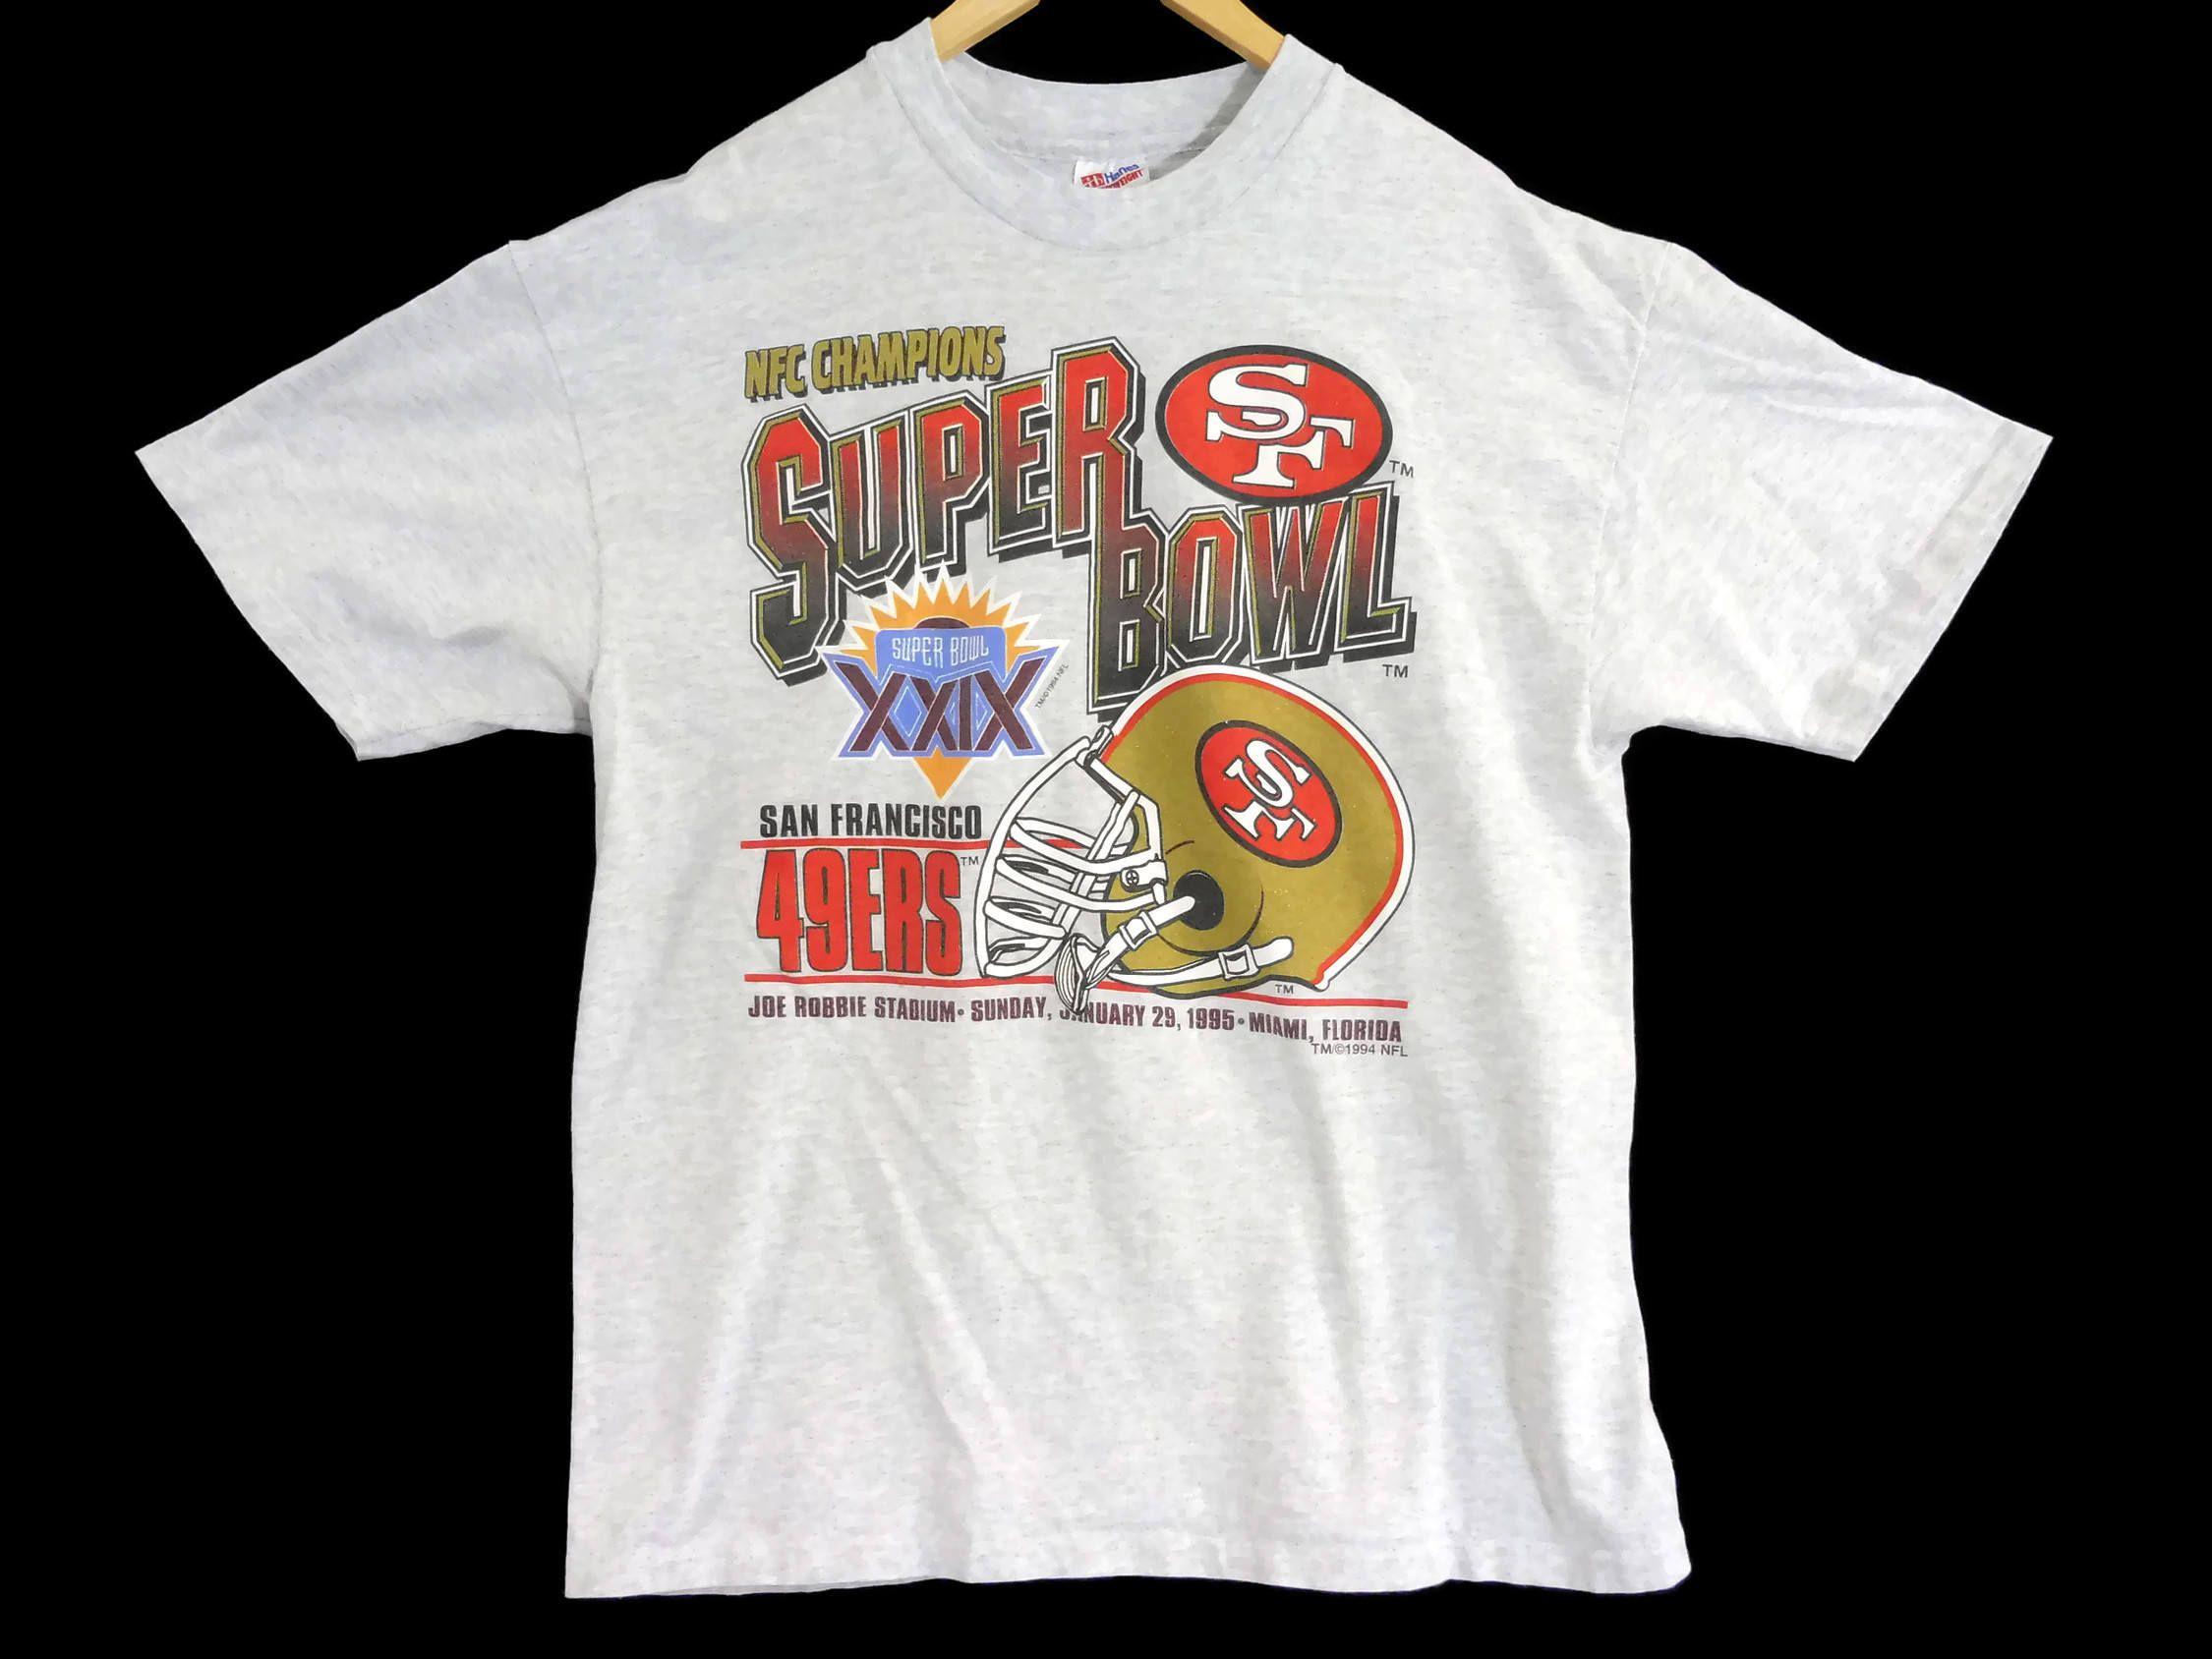 VTG 1994 SF 49ers T-Shirt - Large - Superbowl Champions 1995 - Football -  NFL - Hanes Heavyweight - Vintage Tee - Vintage Clothing - by BLACKMAGIKA  on Etsy 2cf71994b